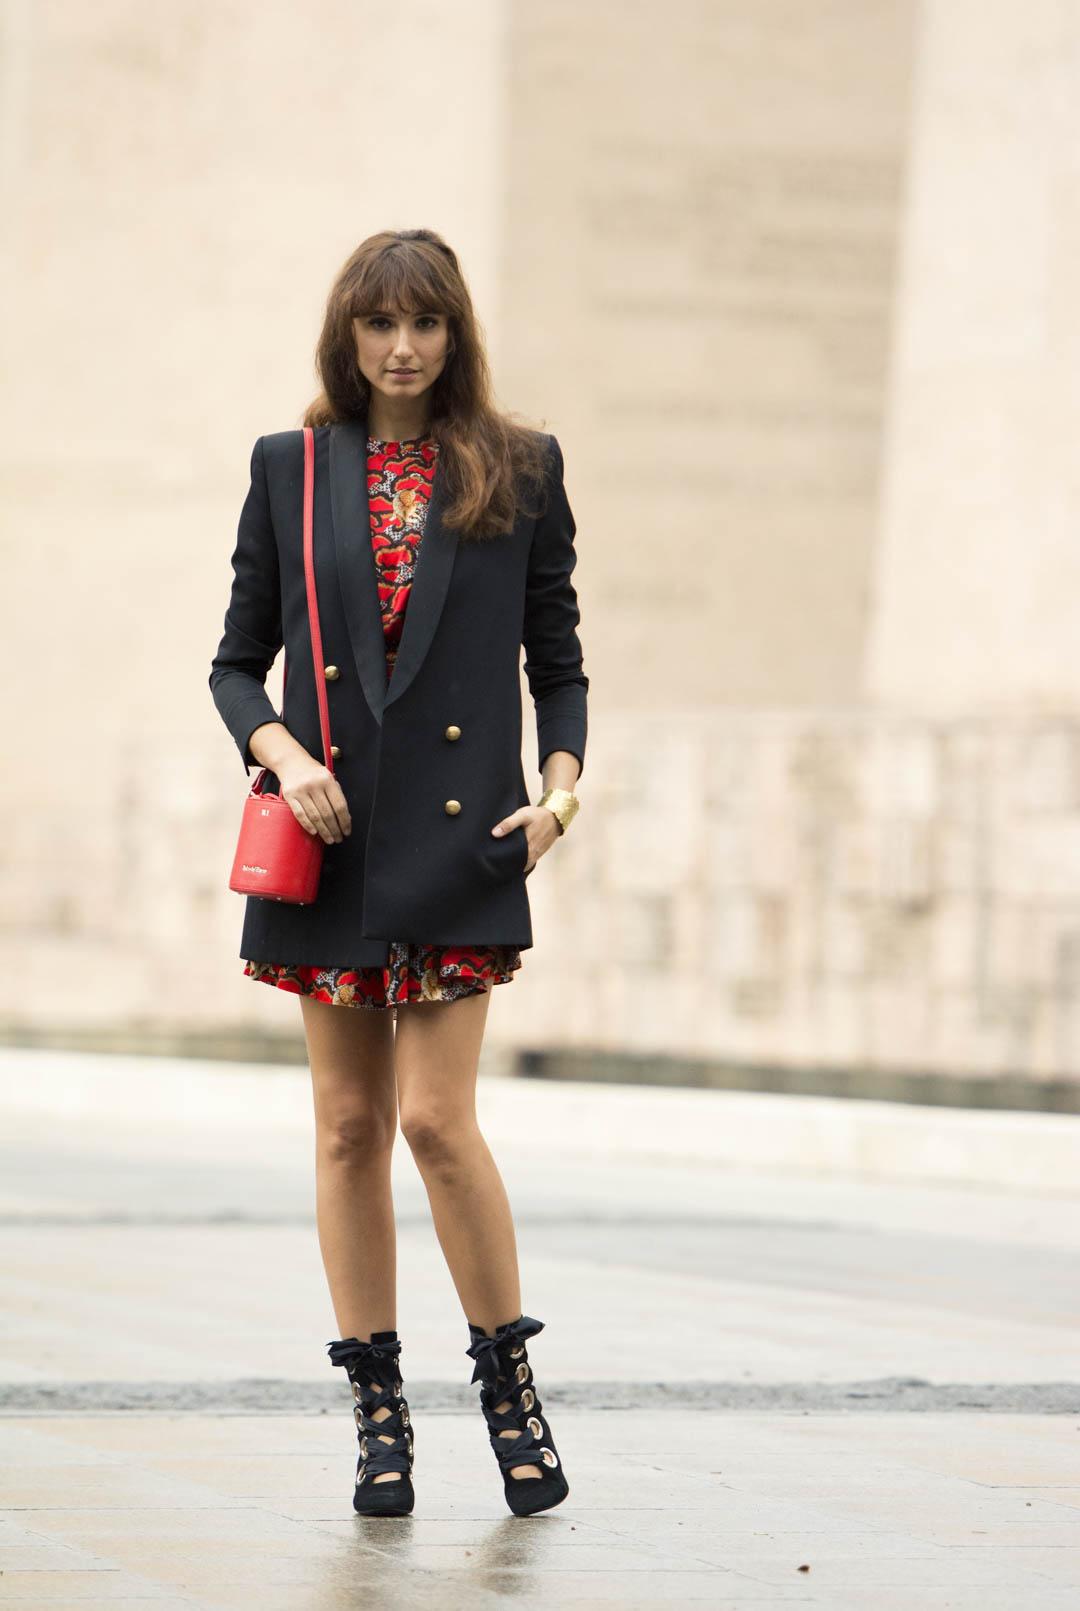 sandro-red-dress-mitmeblog-street-style-mayte-de-la-iglesia-web-02